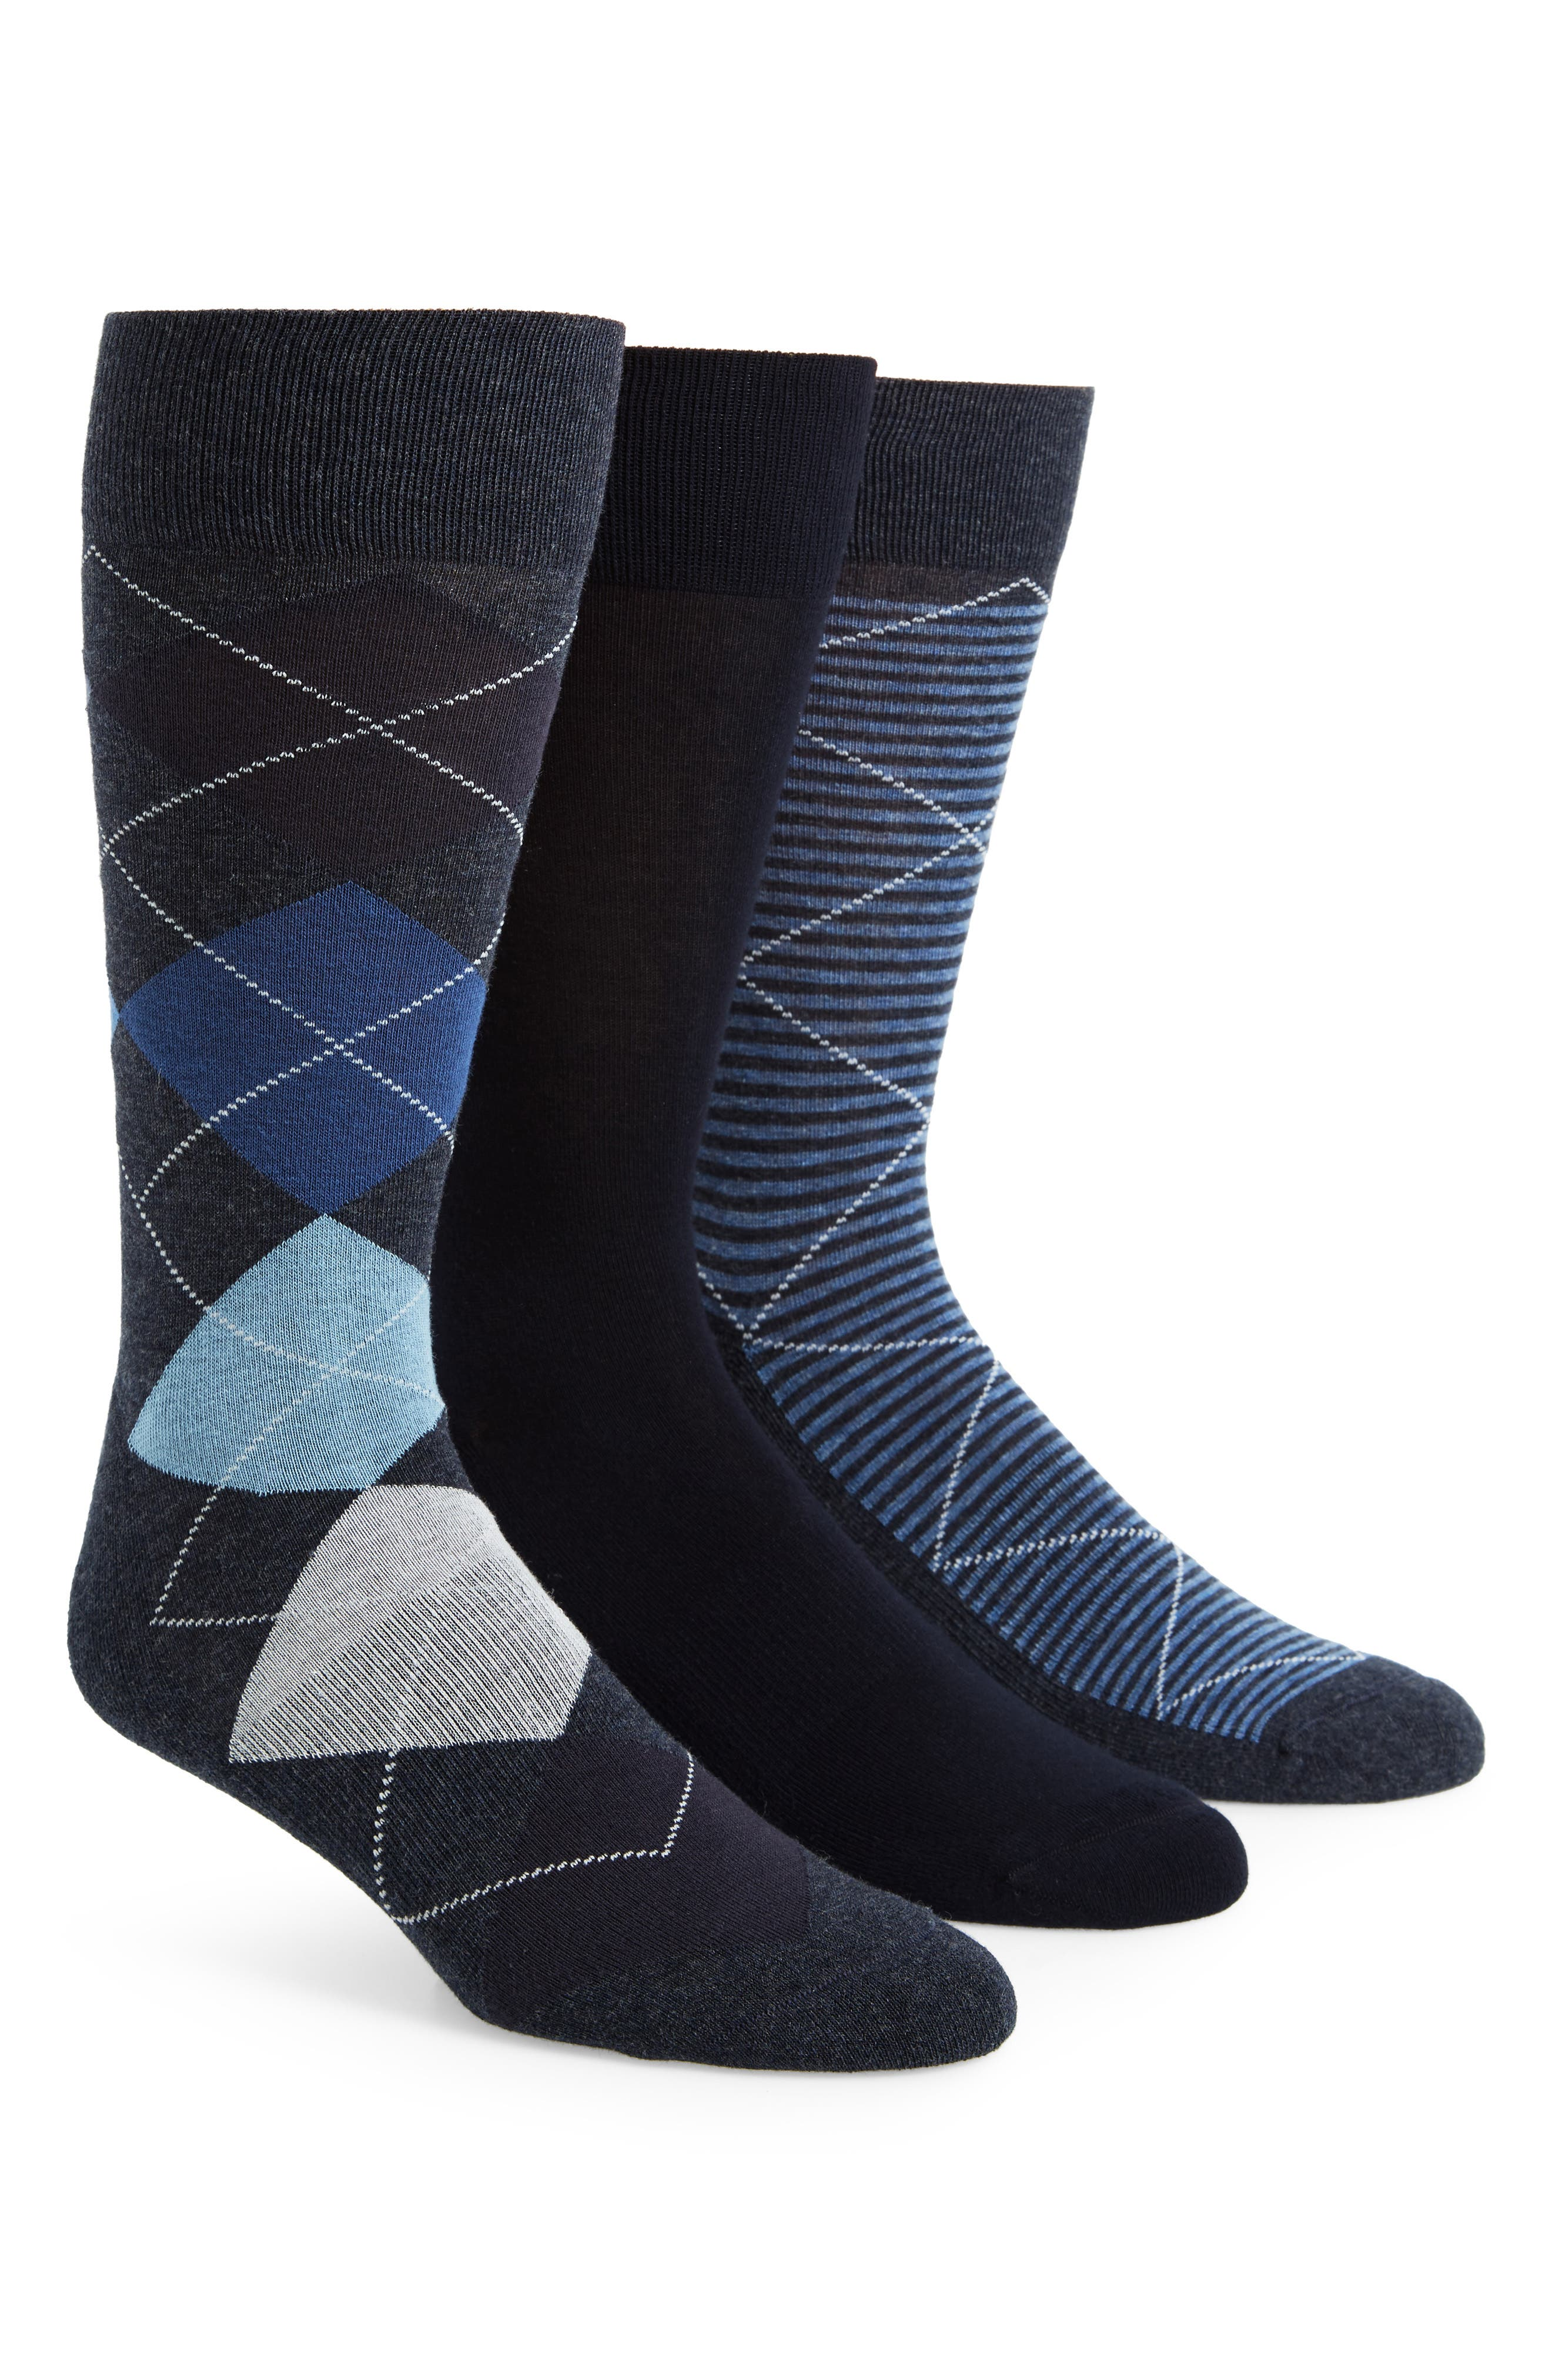 3-Pack Cotton Blend Socks,                         Main,                         color, Navy